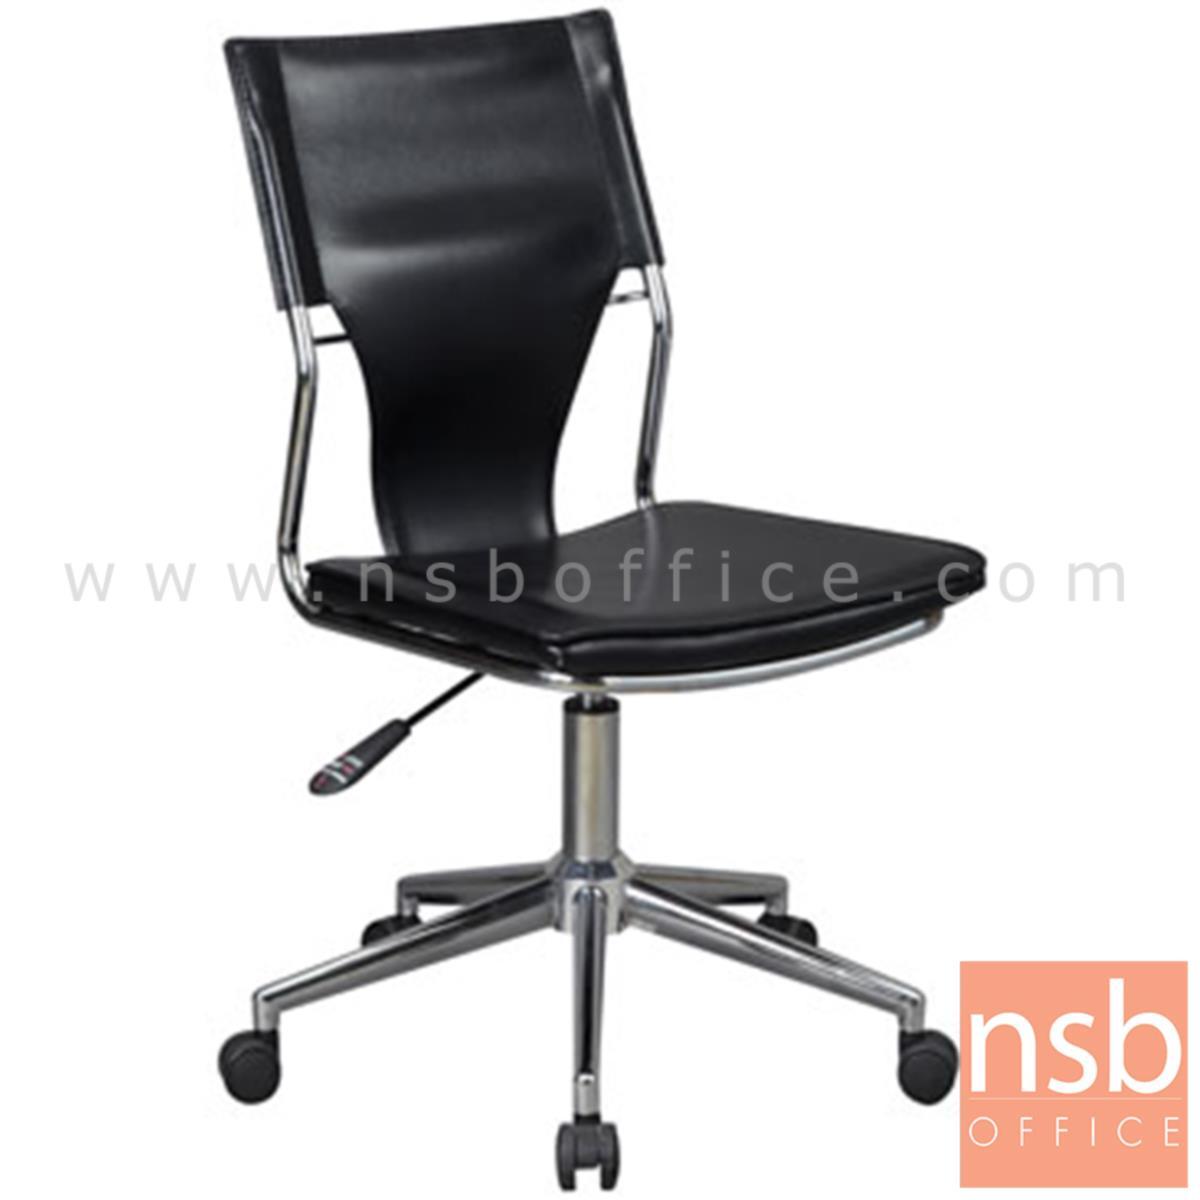 B24A231:เก้าอี้สำนักงาน รุ่น Mayfield (เมย์ฟิลด์)  โช๊คแก๊ส ขาเหล็กชุบโครเมี่ยม